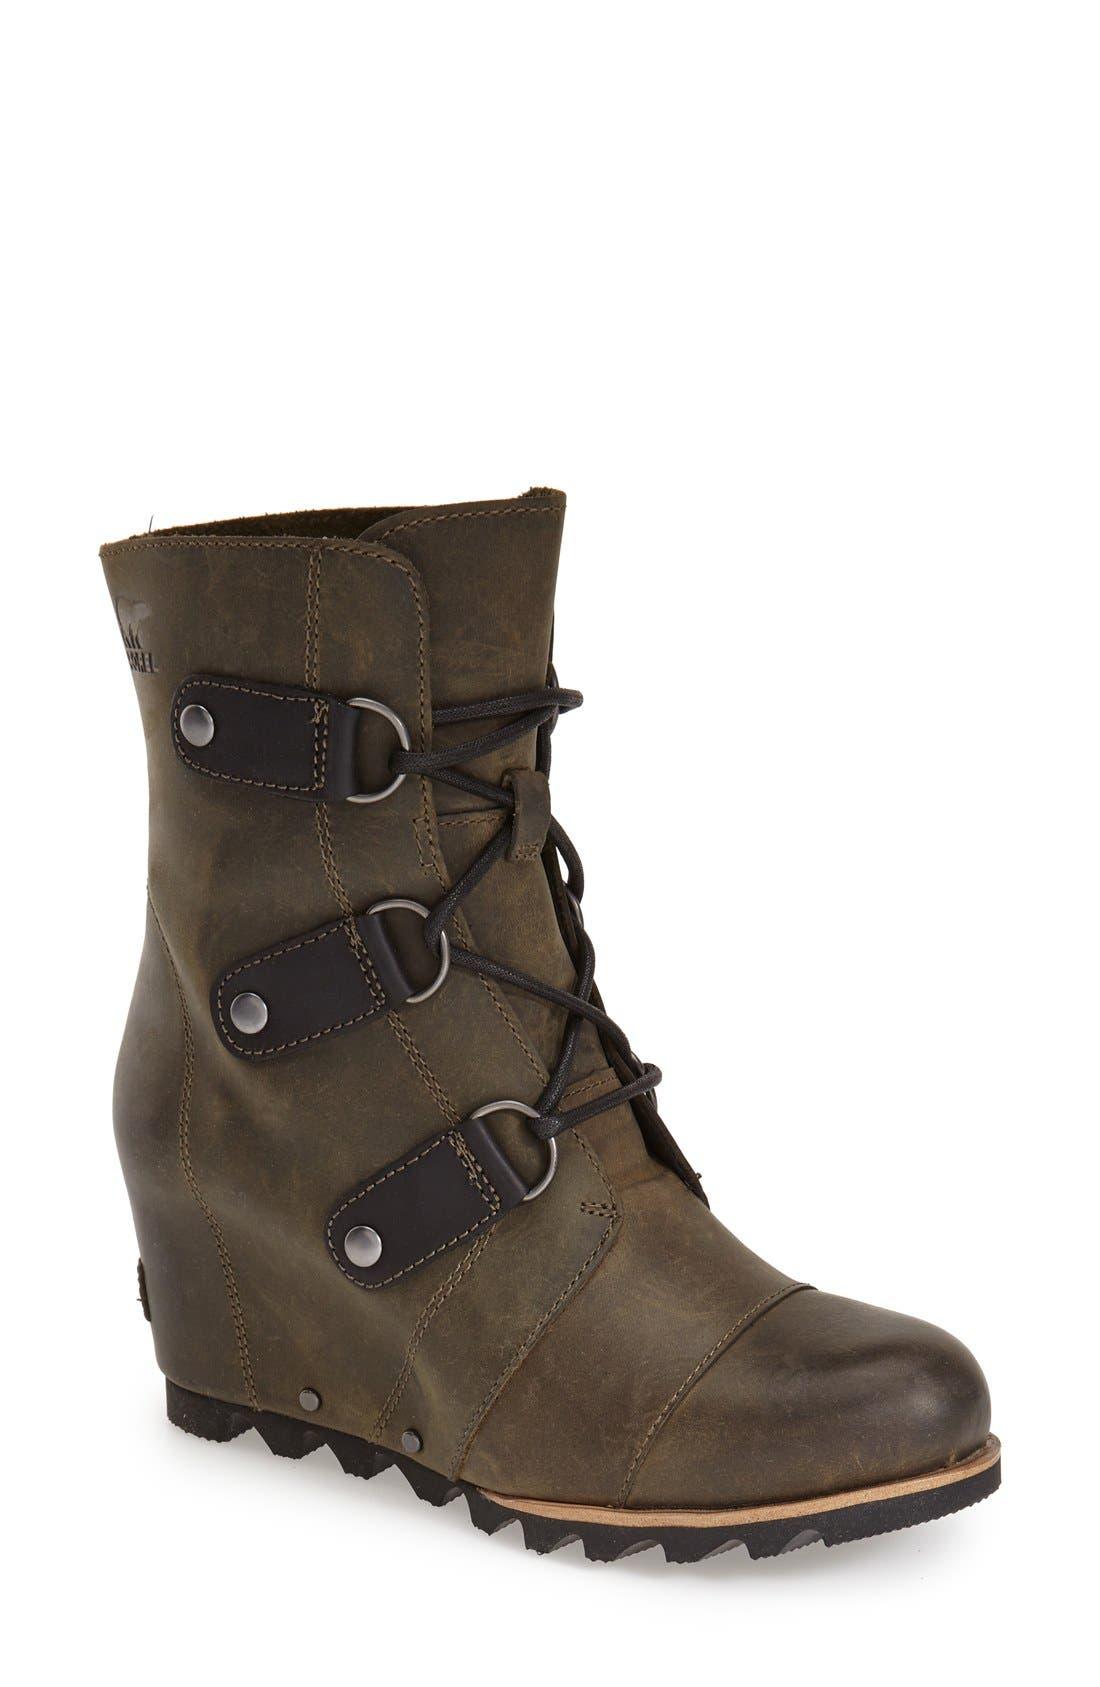 'Joan of Arctic' Waterproof Wedge Boot,                         Main,                         color, Nori Green Leather